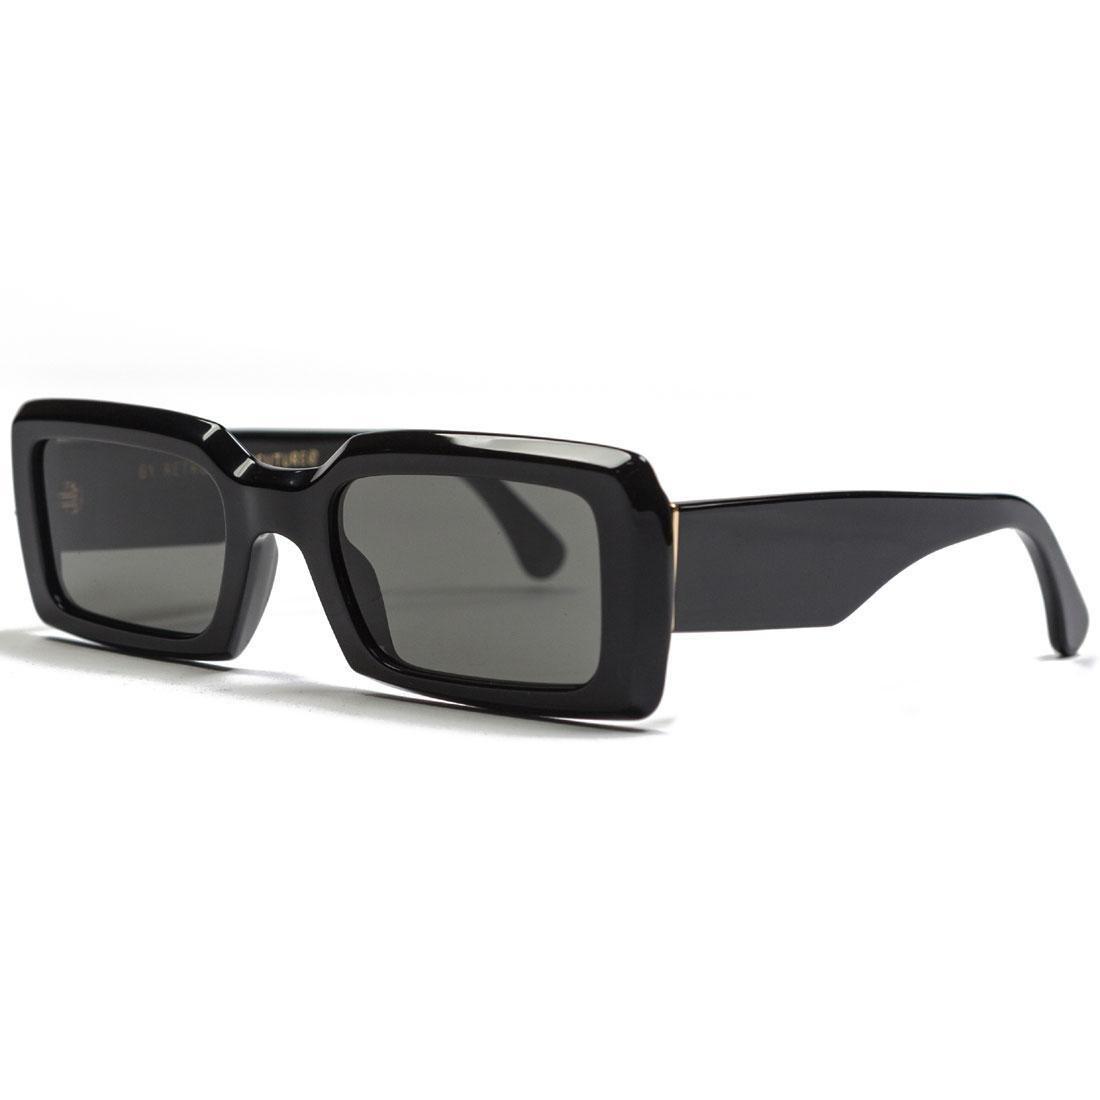 Super Sunglasses Sacro Sunglasses (black)